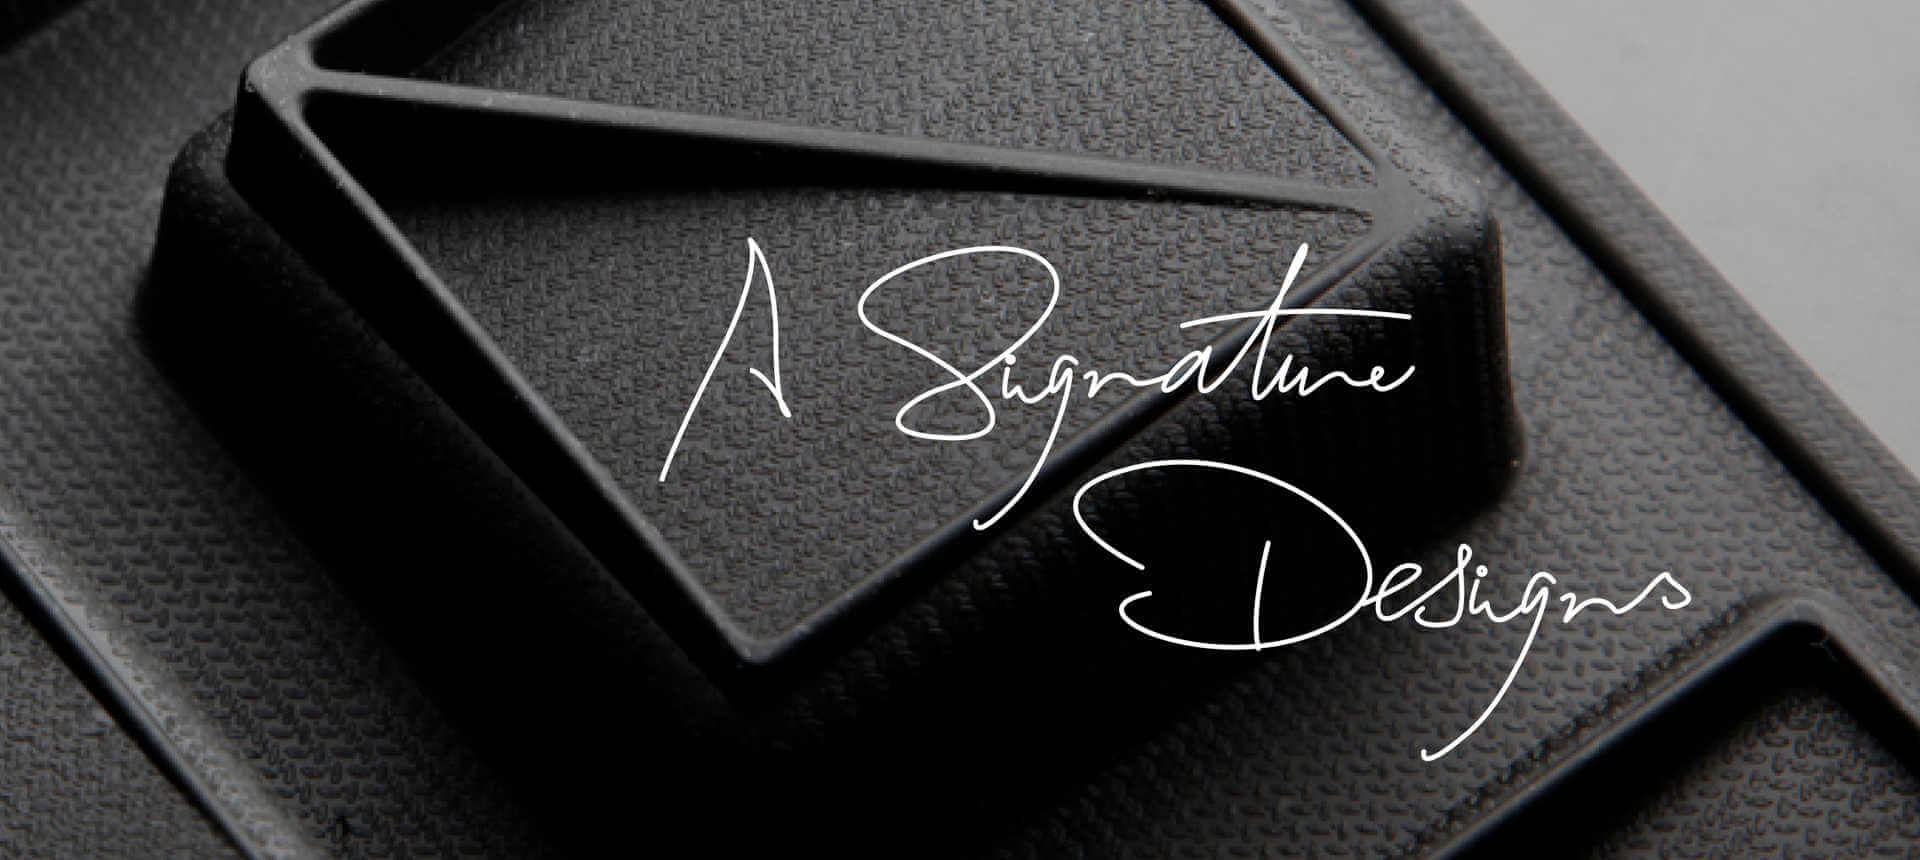 Affiche A Signature Deisgns